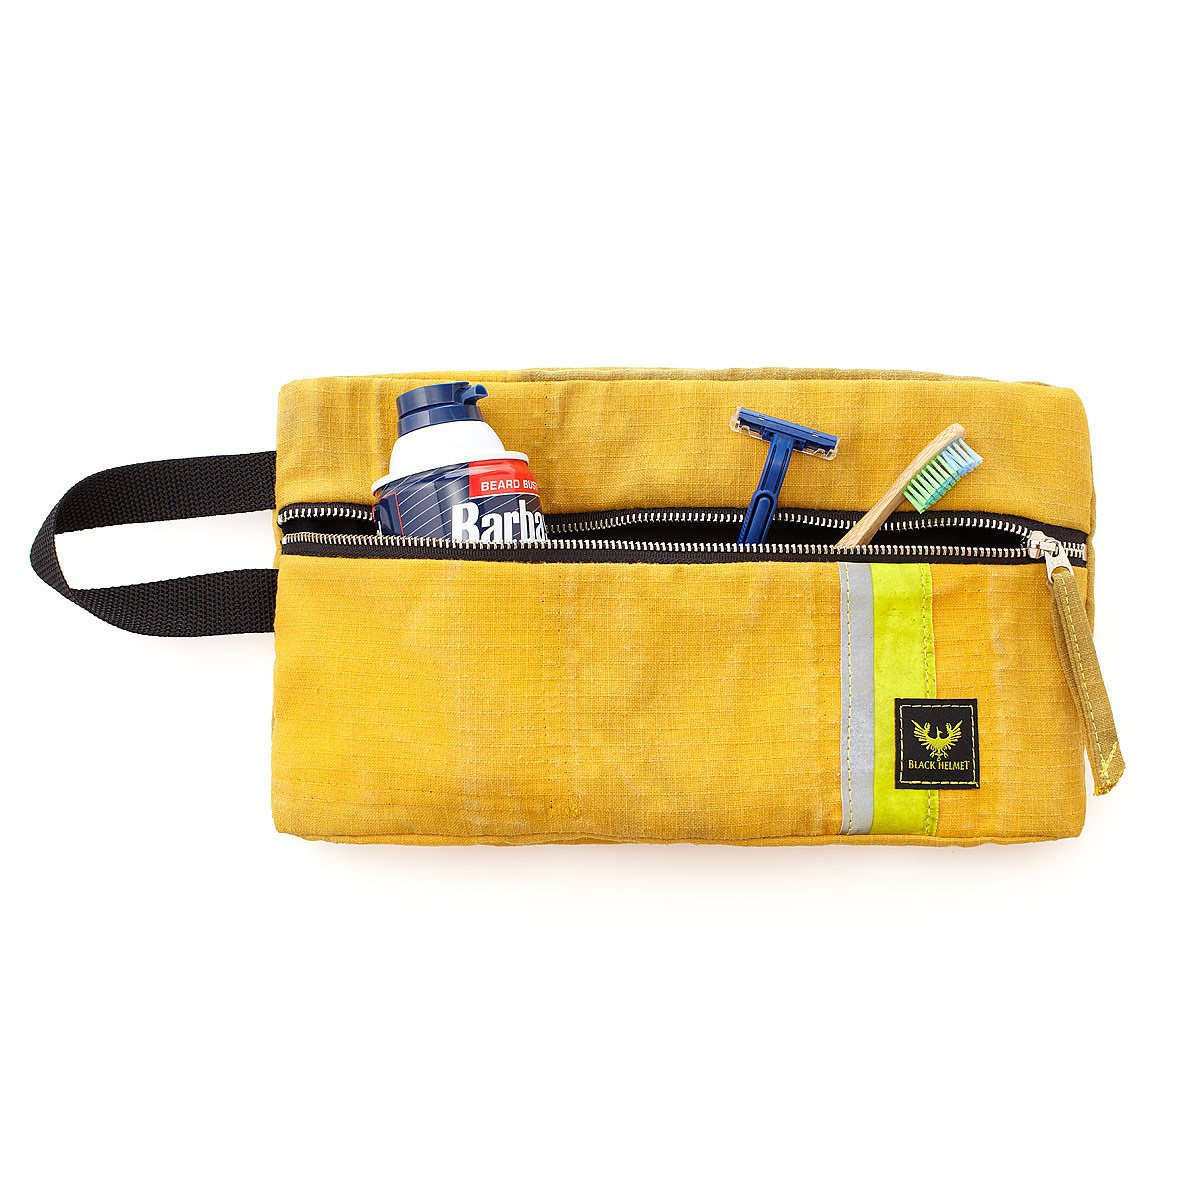 Recycled bunker gear bags - Fire Gear Dopp Bag 2 Thumbnail